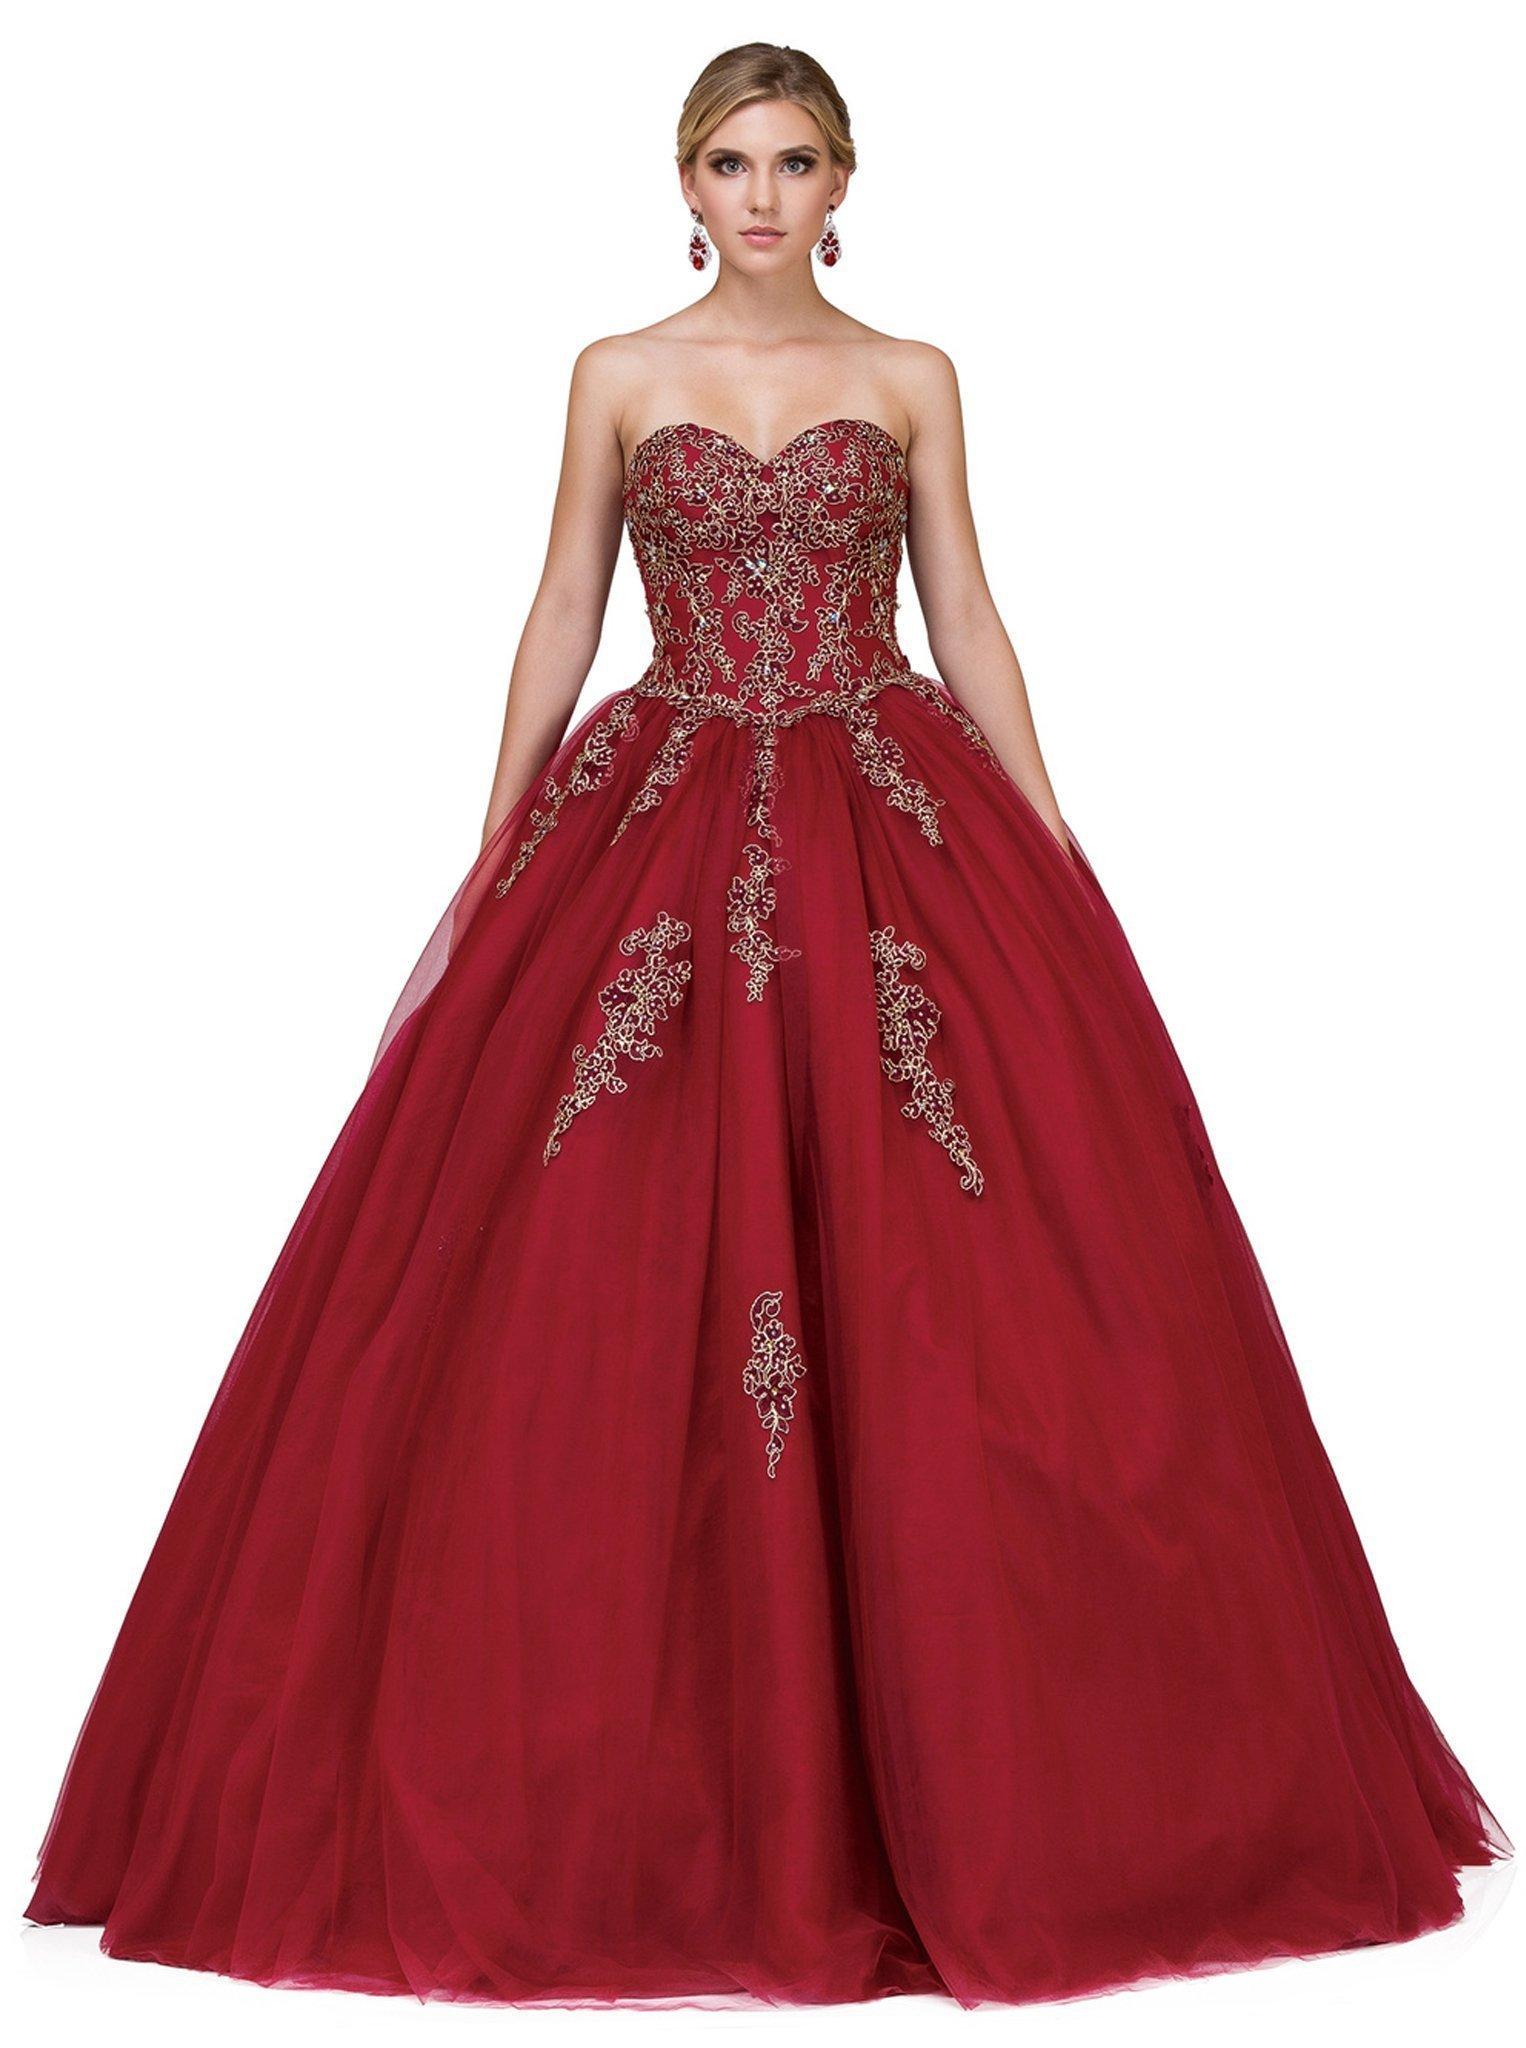 Dancing Queen - 1189 Embellished Strapless Sweetheart Quinceanera Ballgown